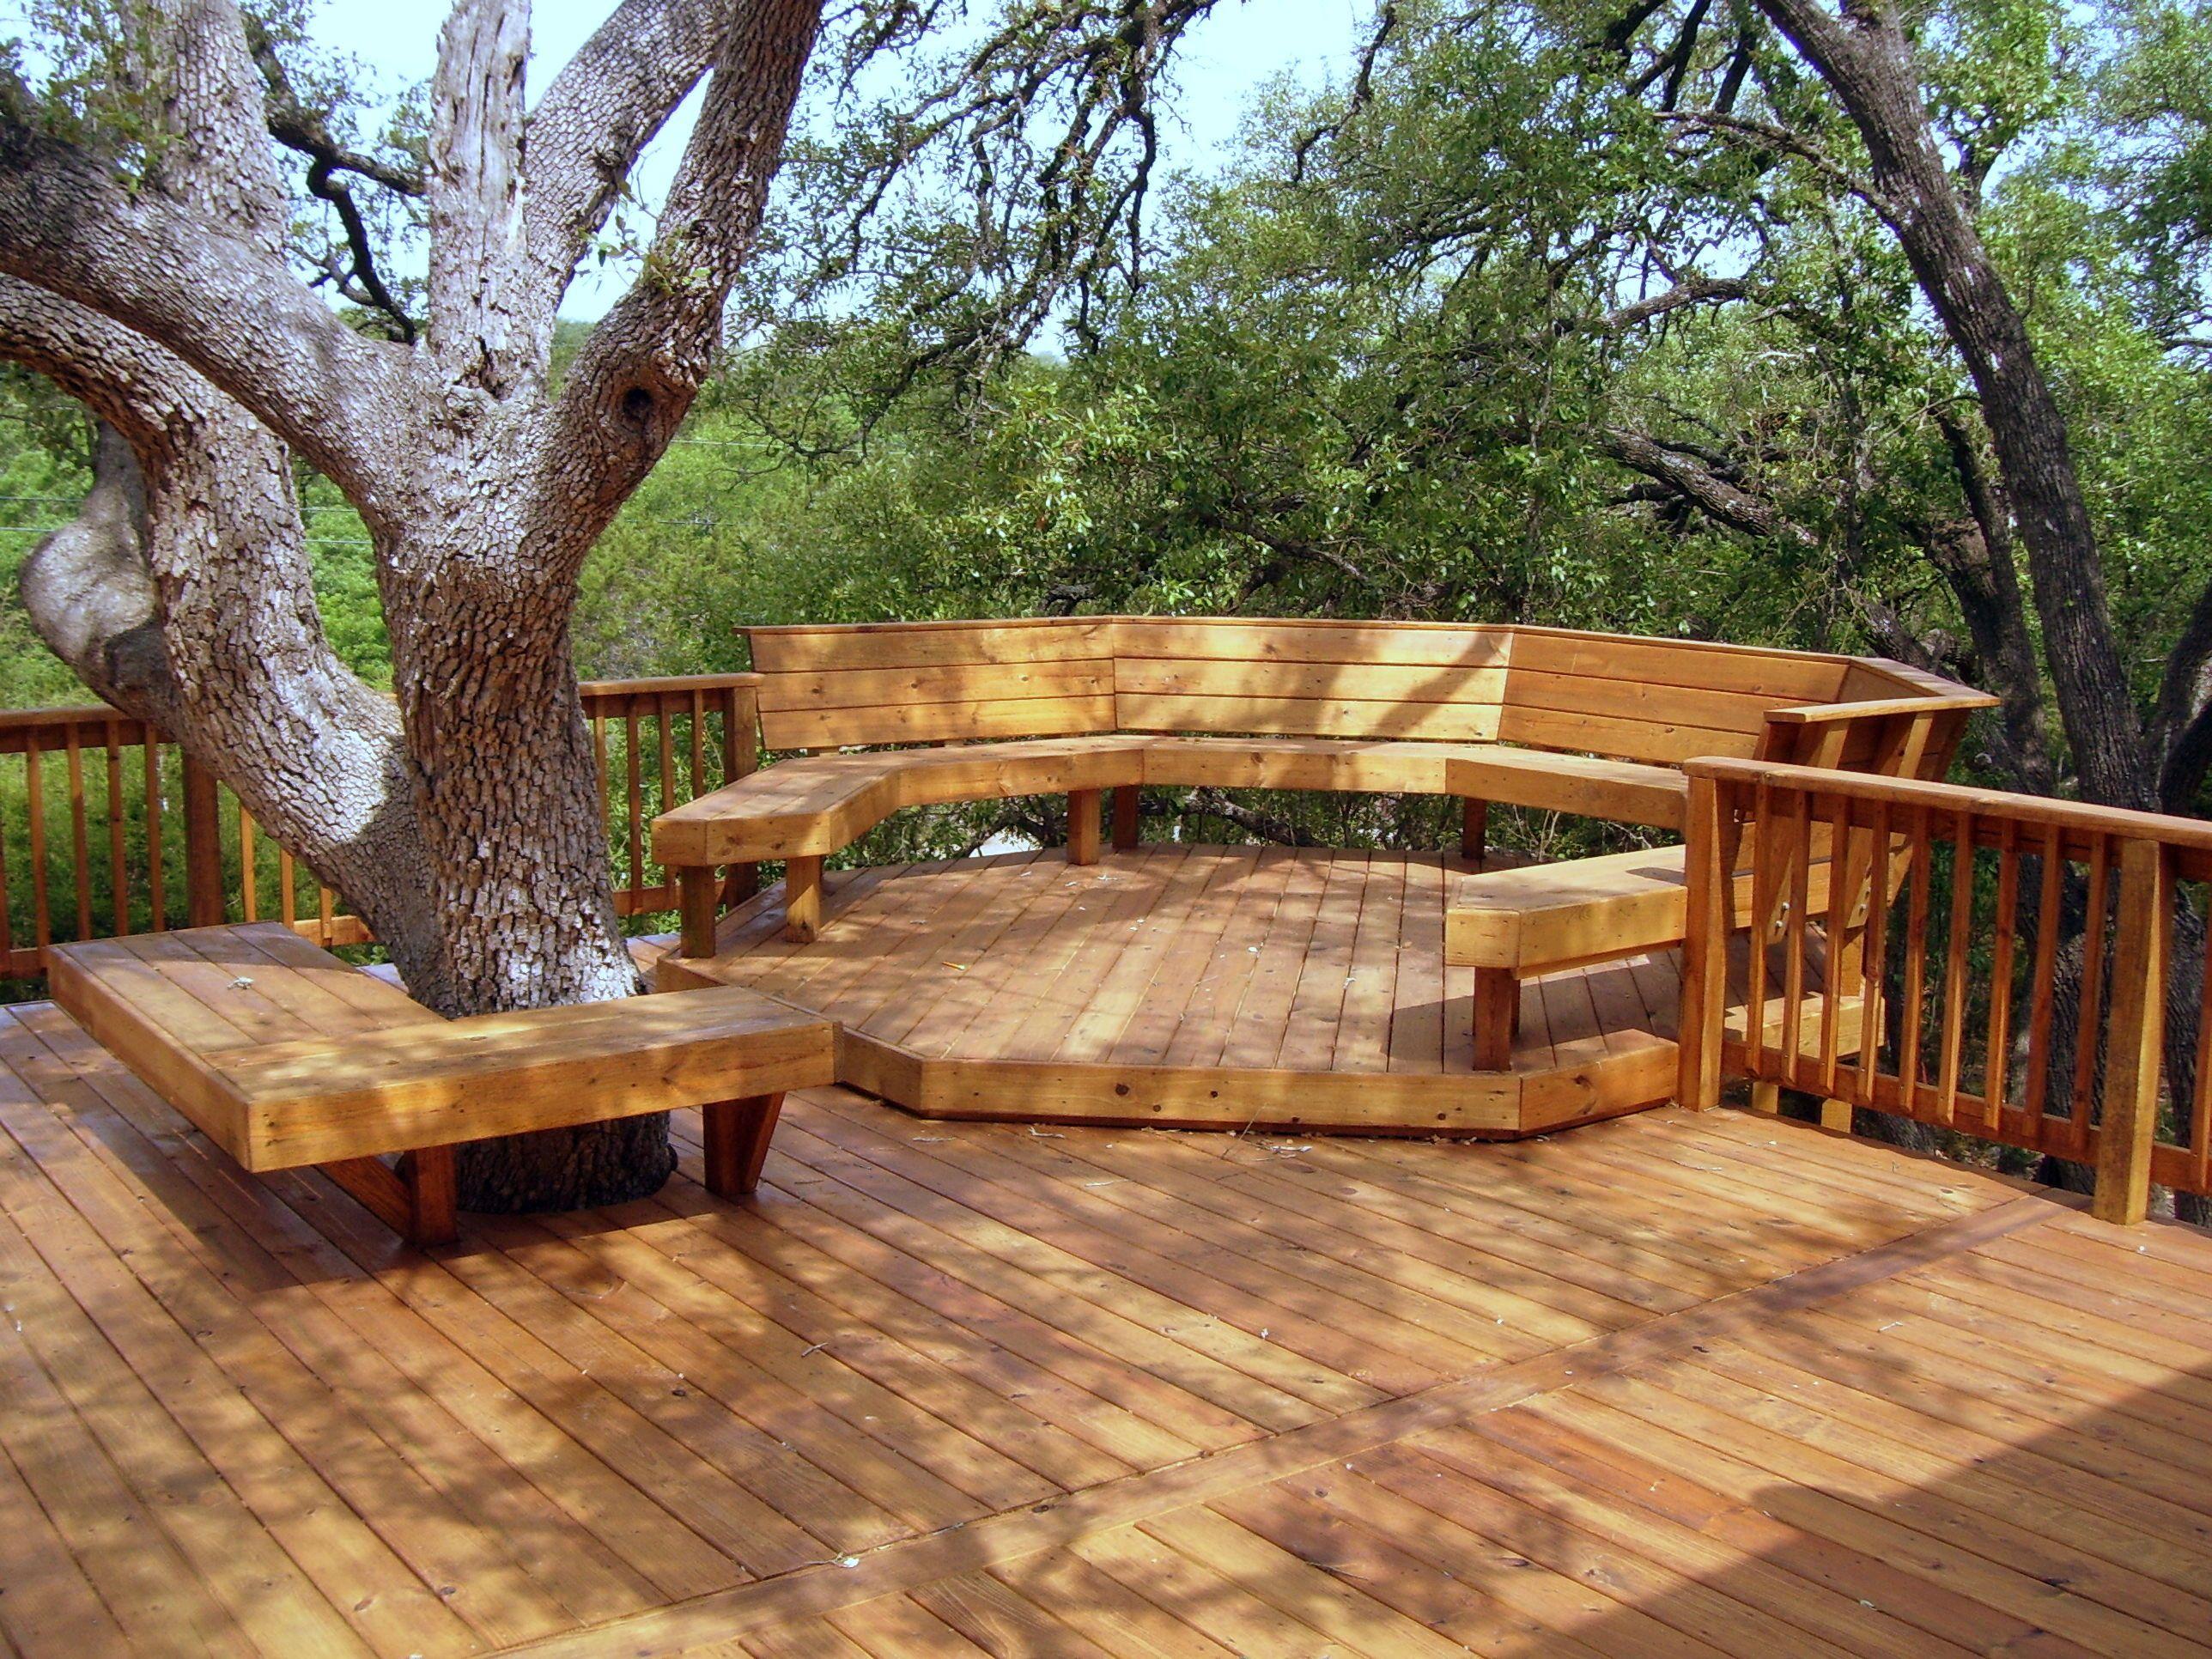 Beautiful Back Decks Decks Builds Designs Wood Decks Trex Decks